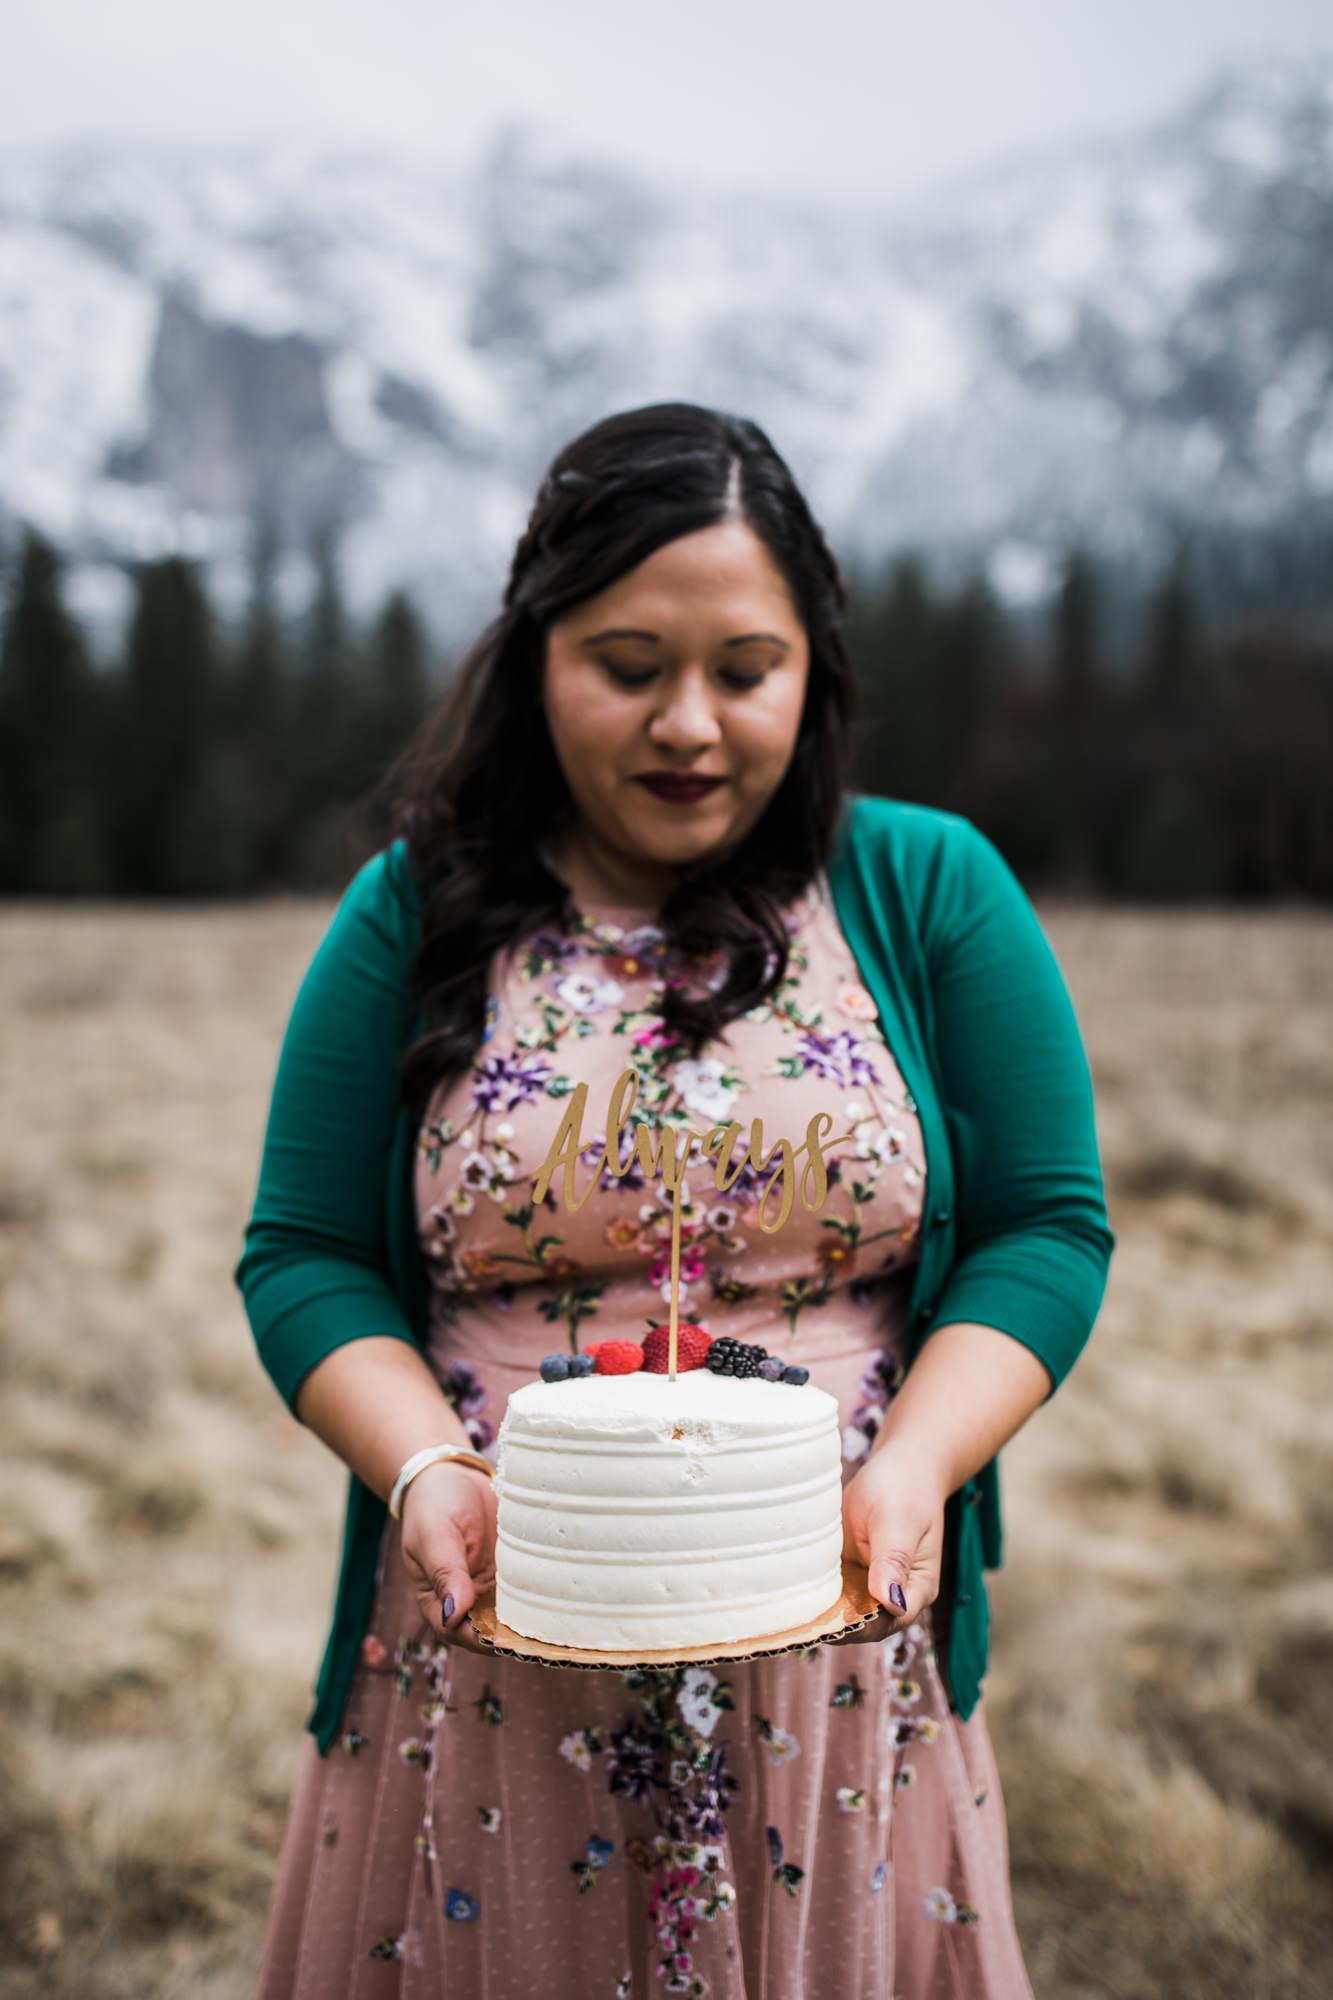 mini wedding cake for your adventure elopement